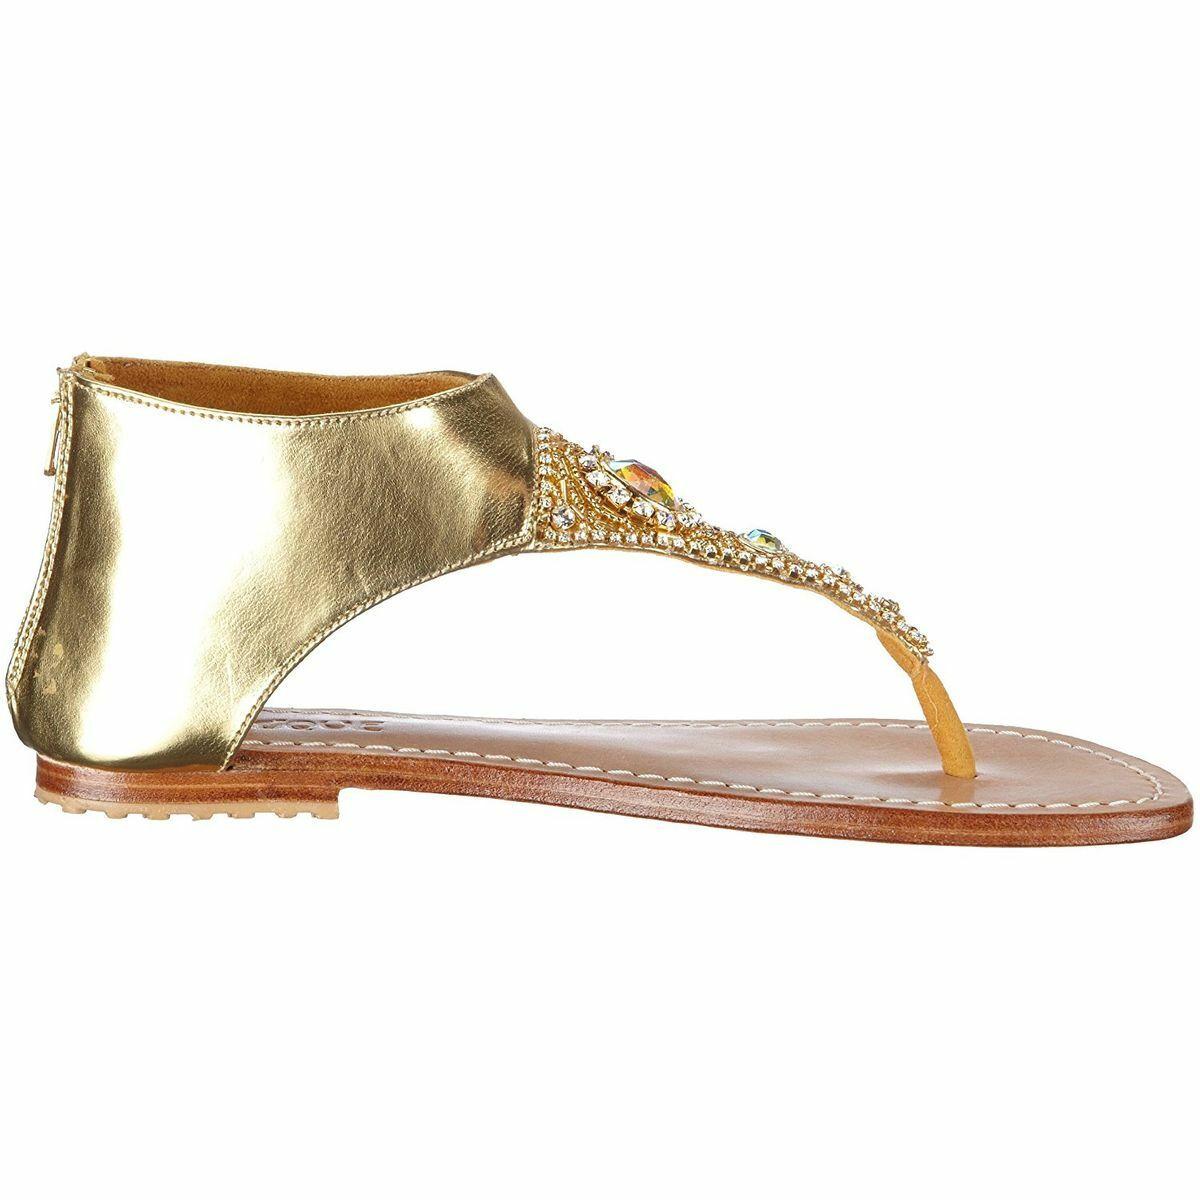 Mystique Sandaletten gold Leder 4048 4048 Gr.40